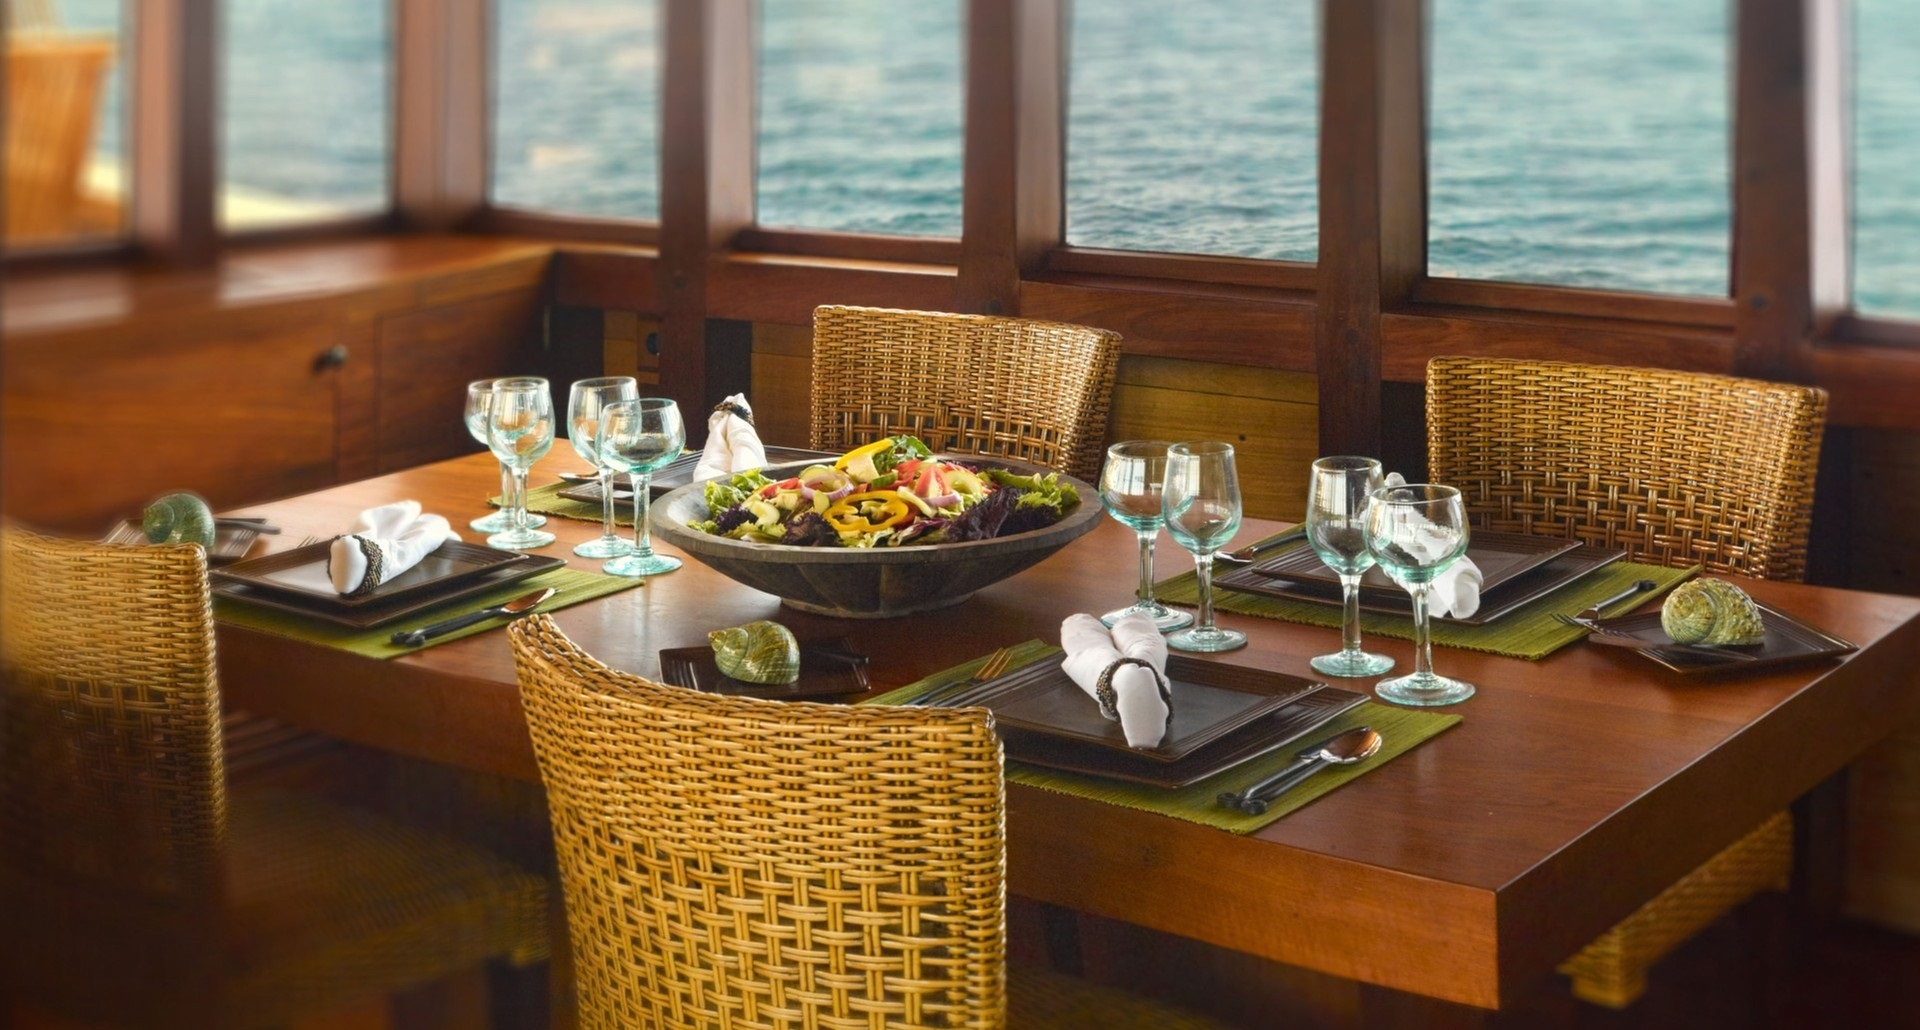 Tasting The Chef's Exquisite Cuisine On Board SI DATU BUA